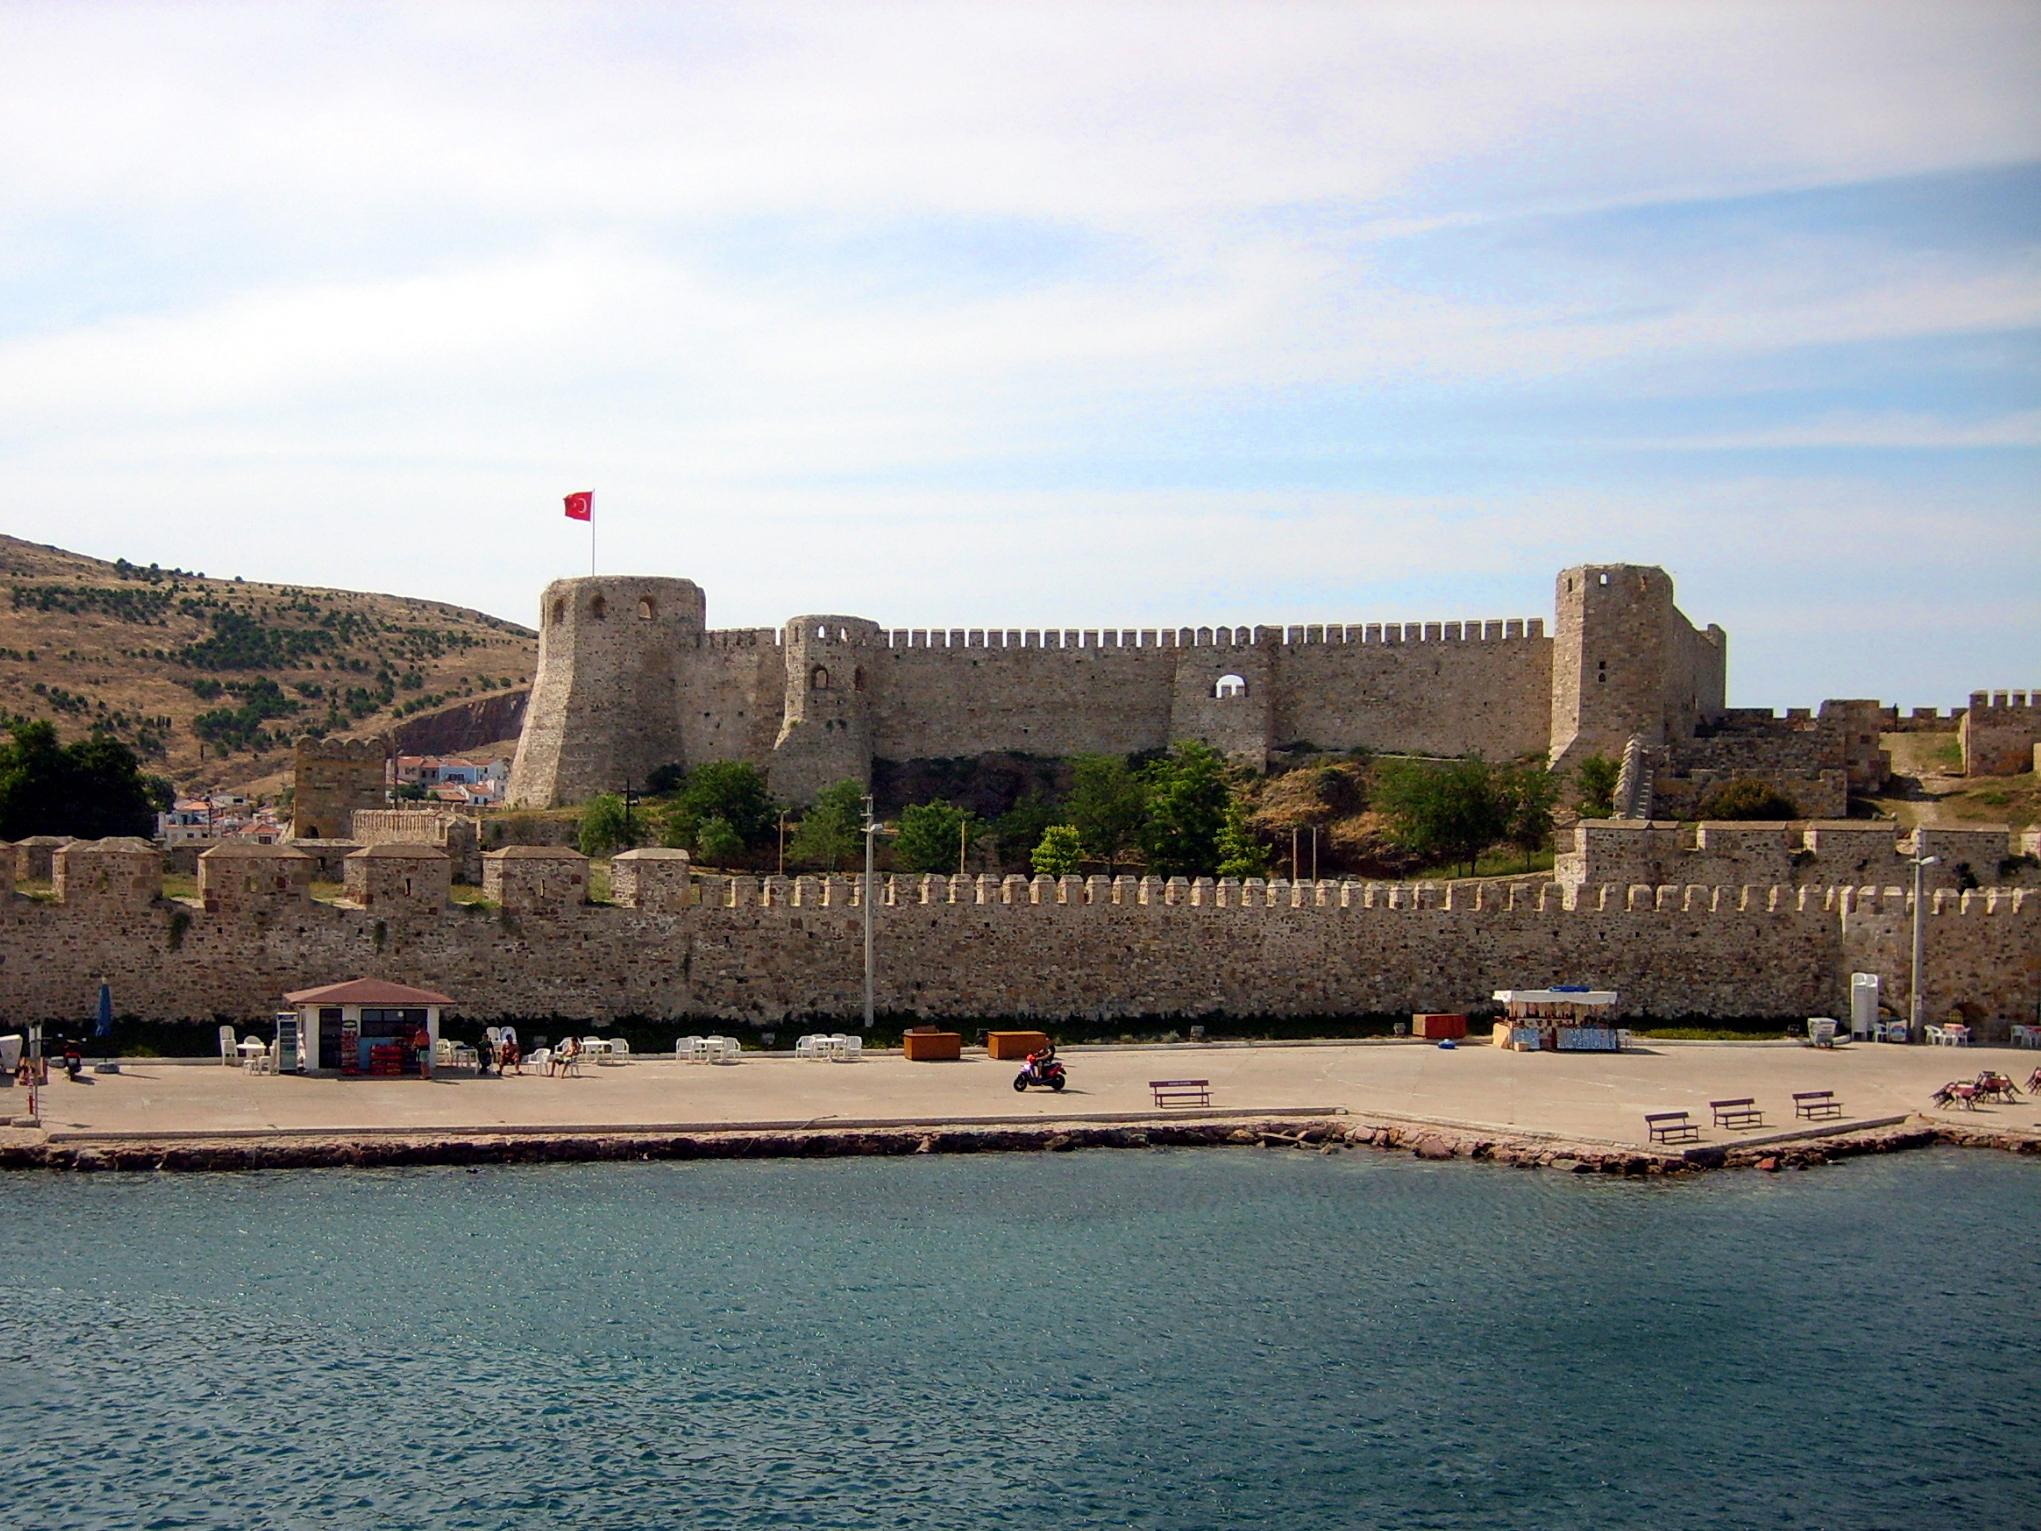 File:Bozcaada, Çanakkale Province.jpg - Wikipedia